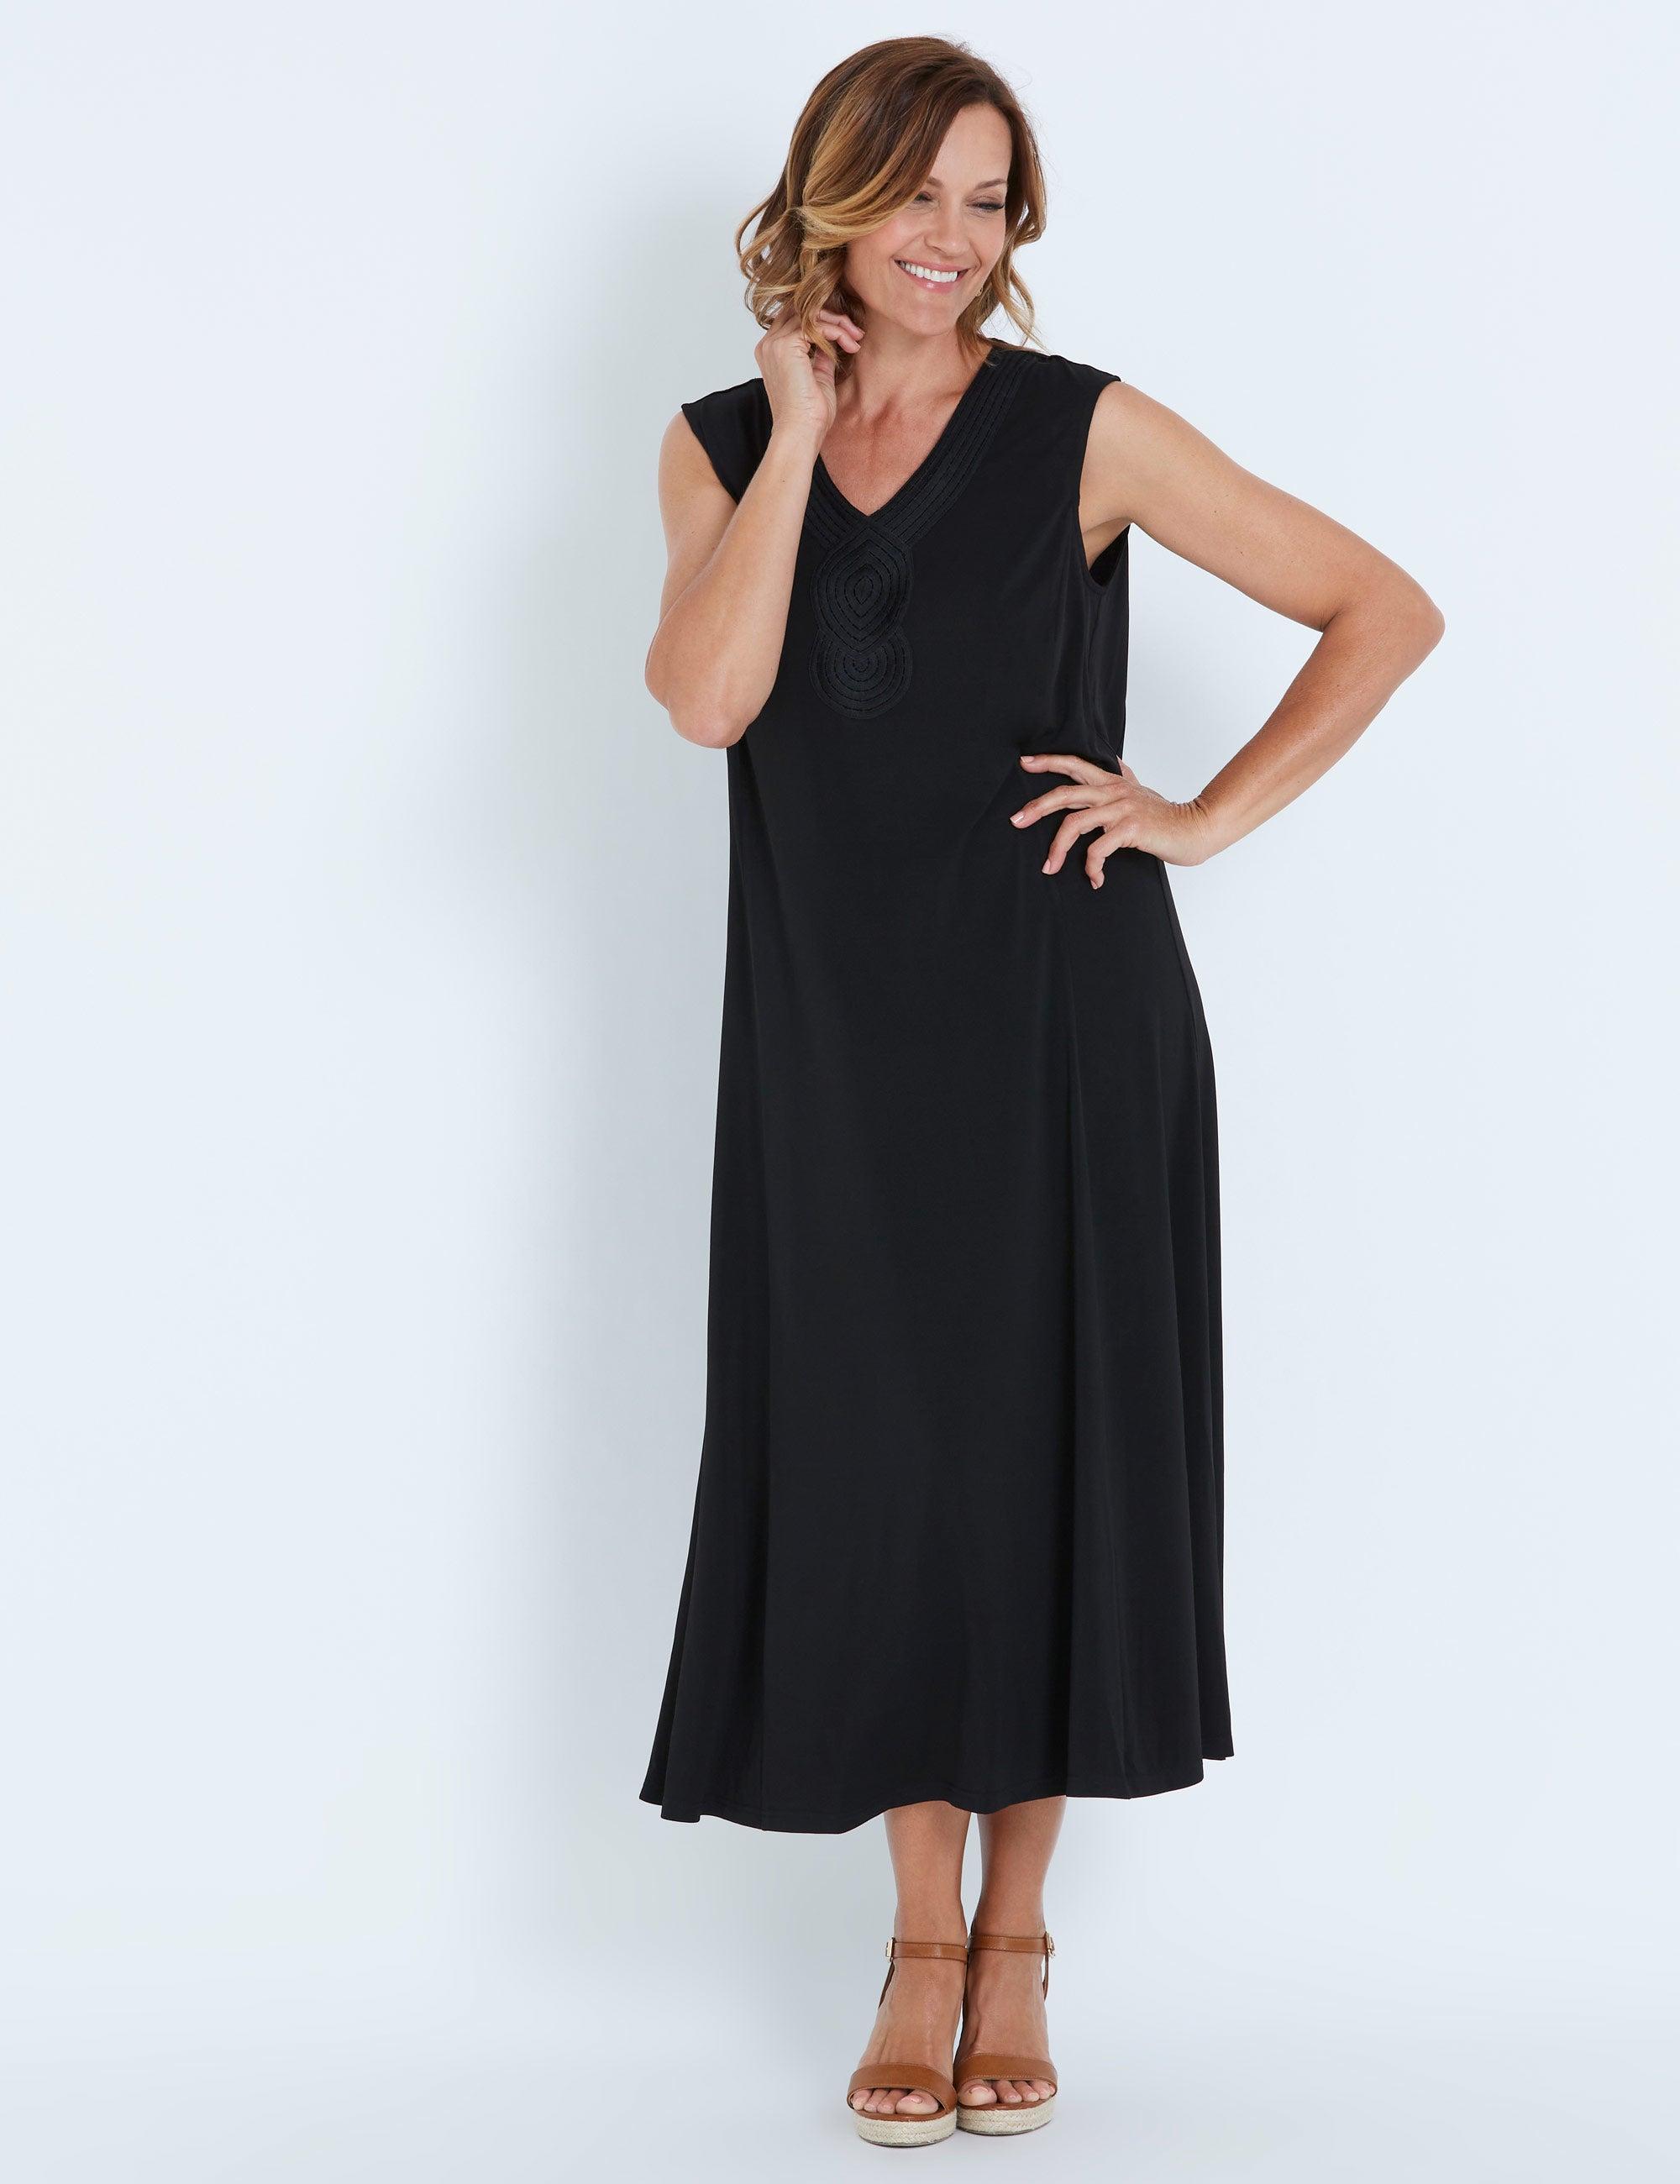 Black Dresses - Formal, Casual